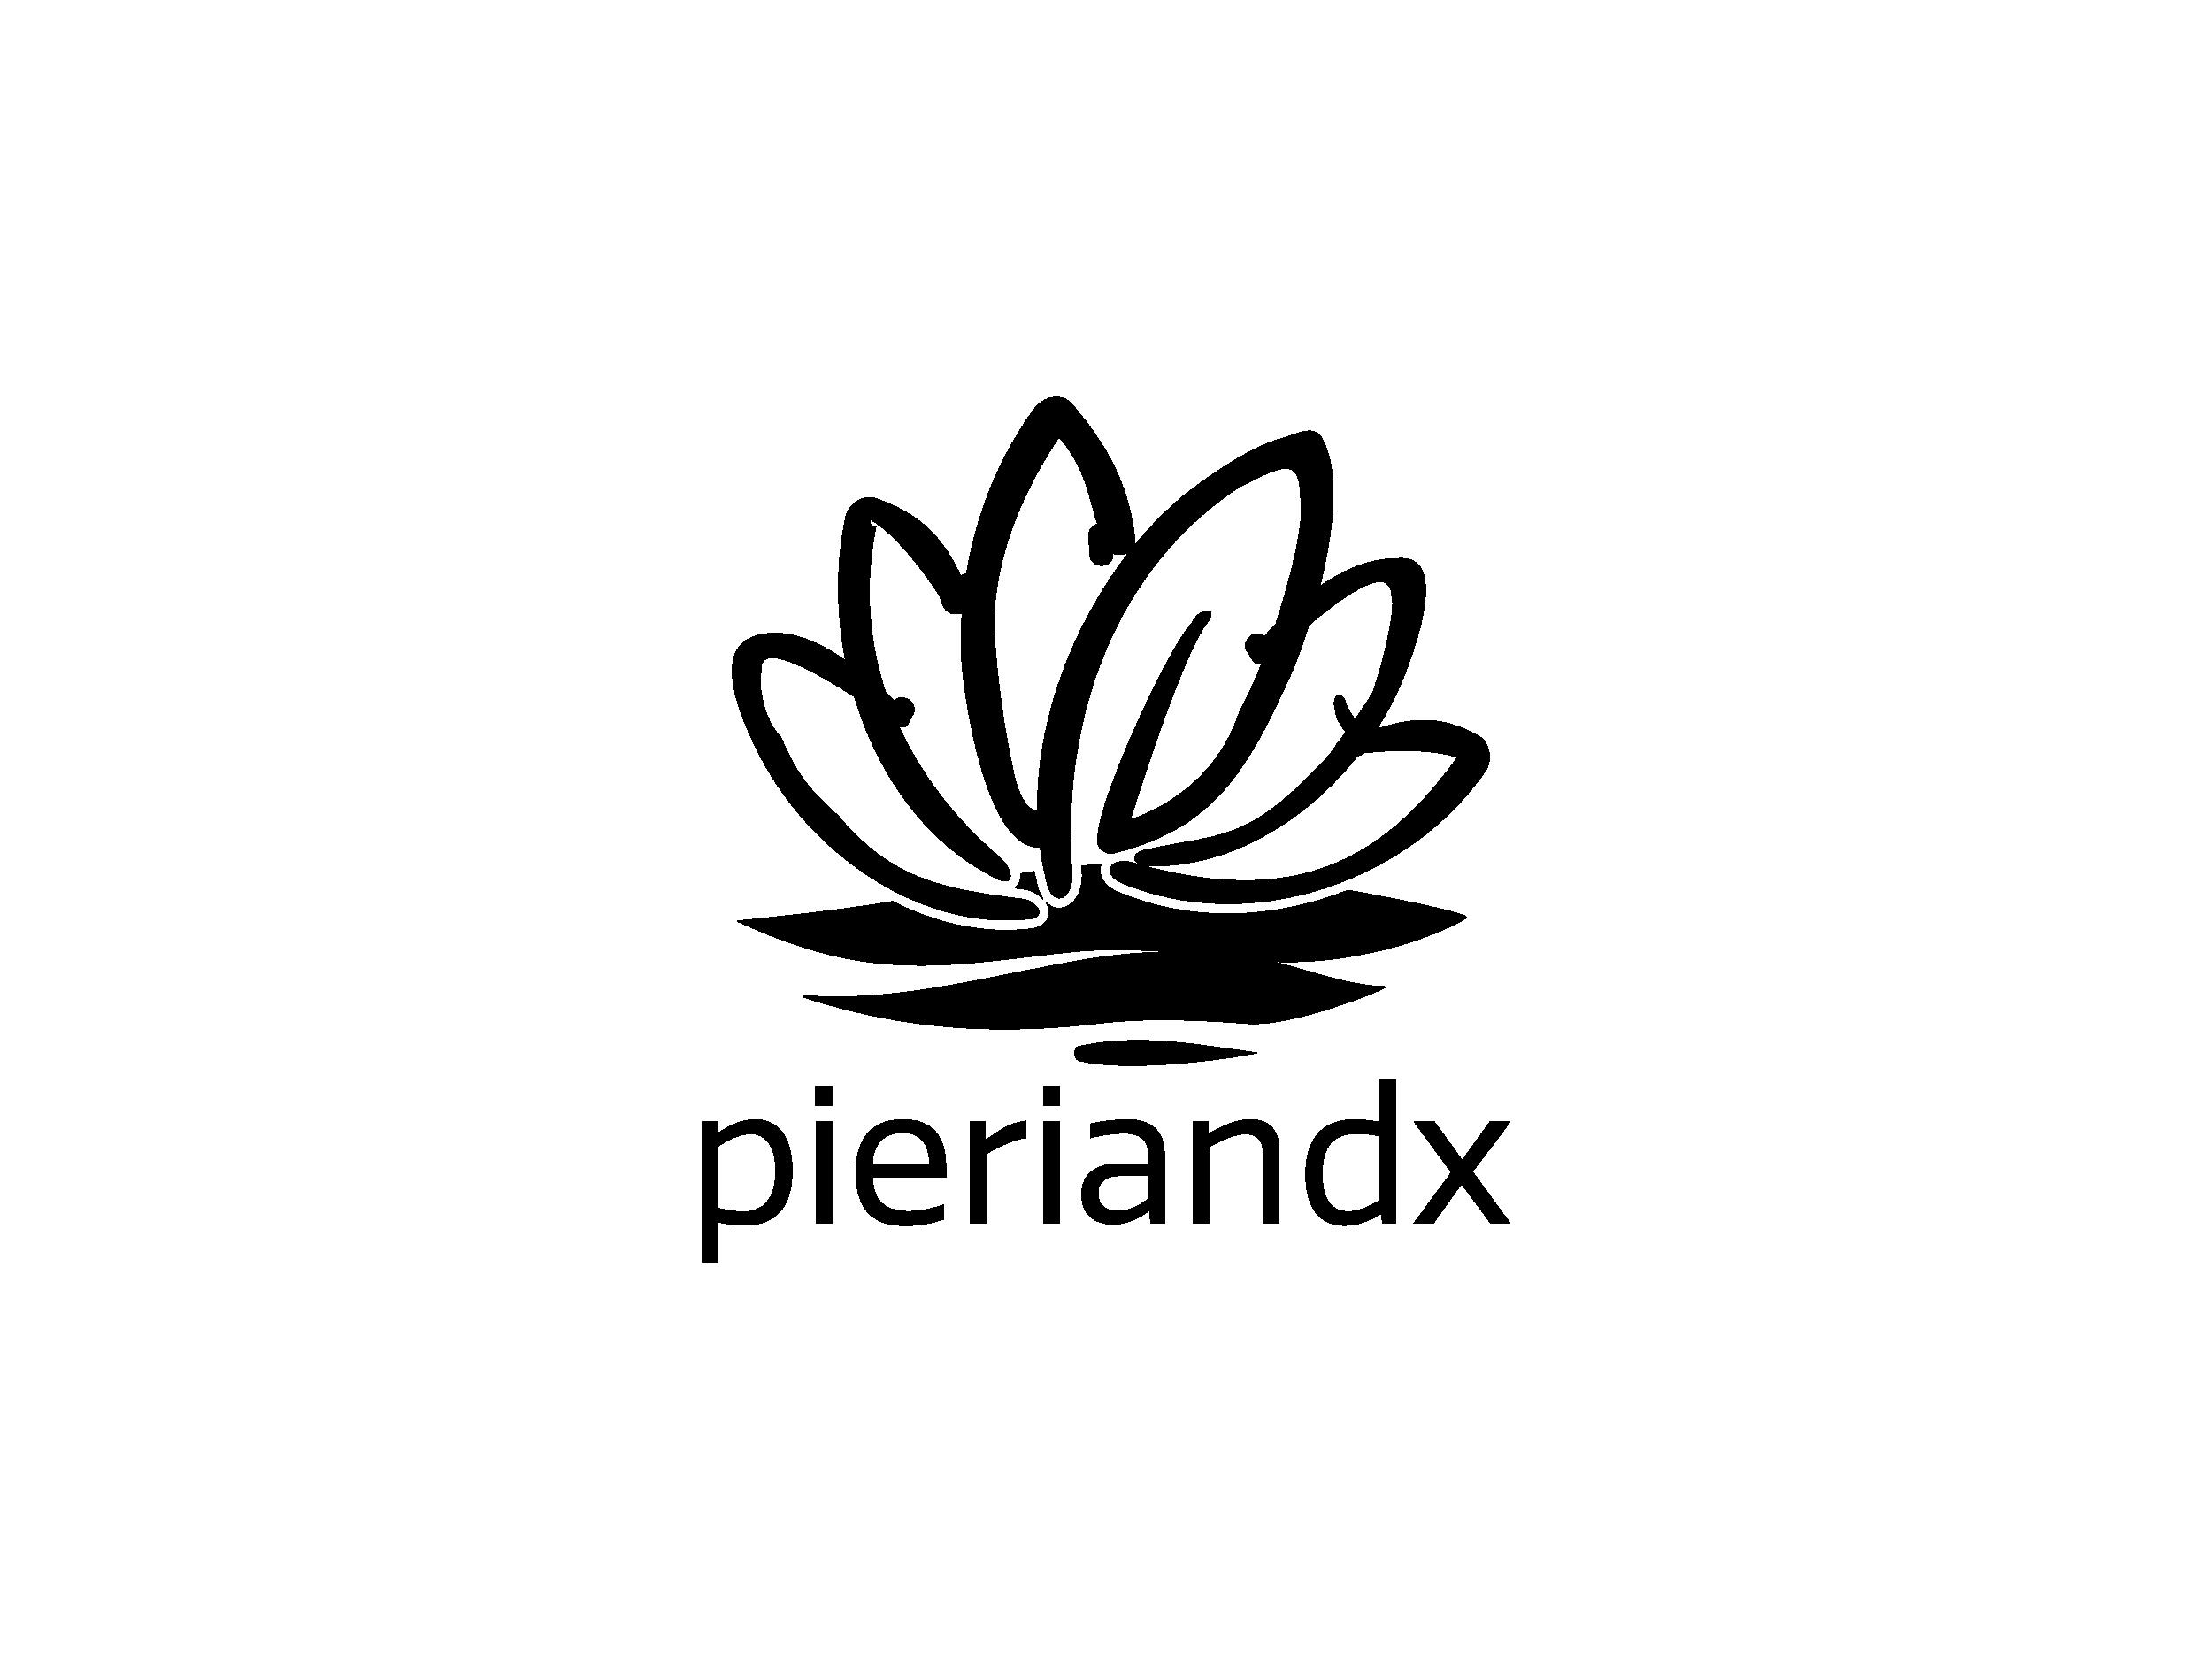 Portfolio logos_Pierian DX